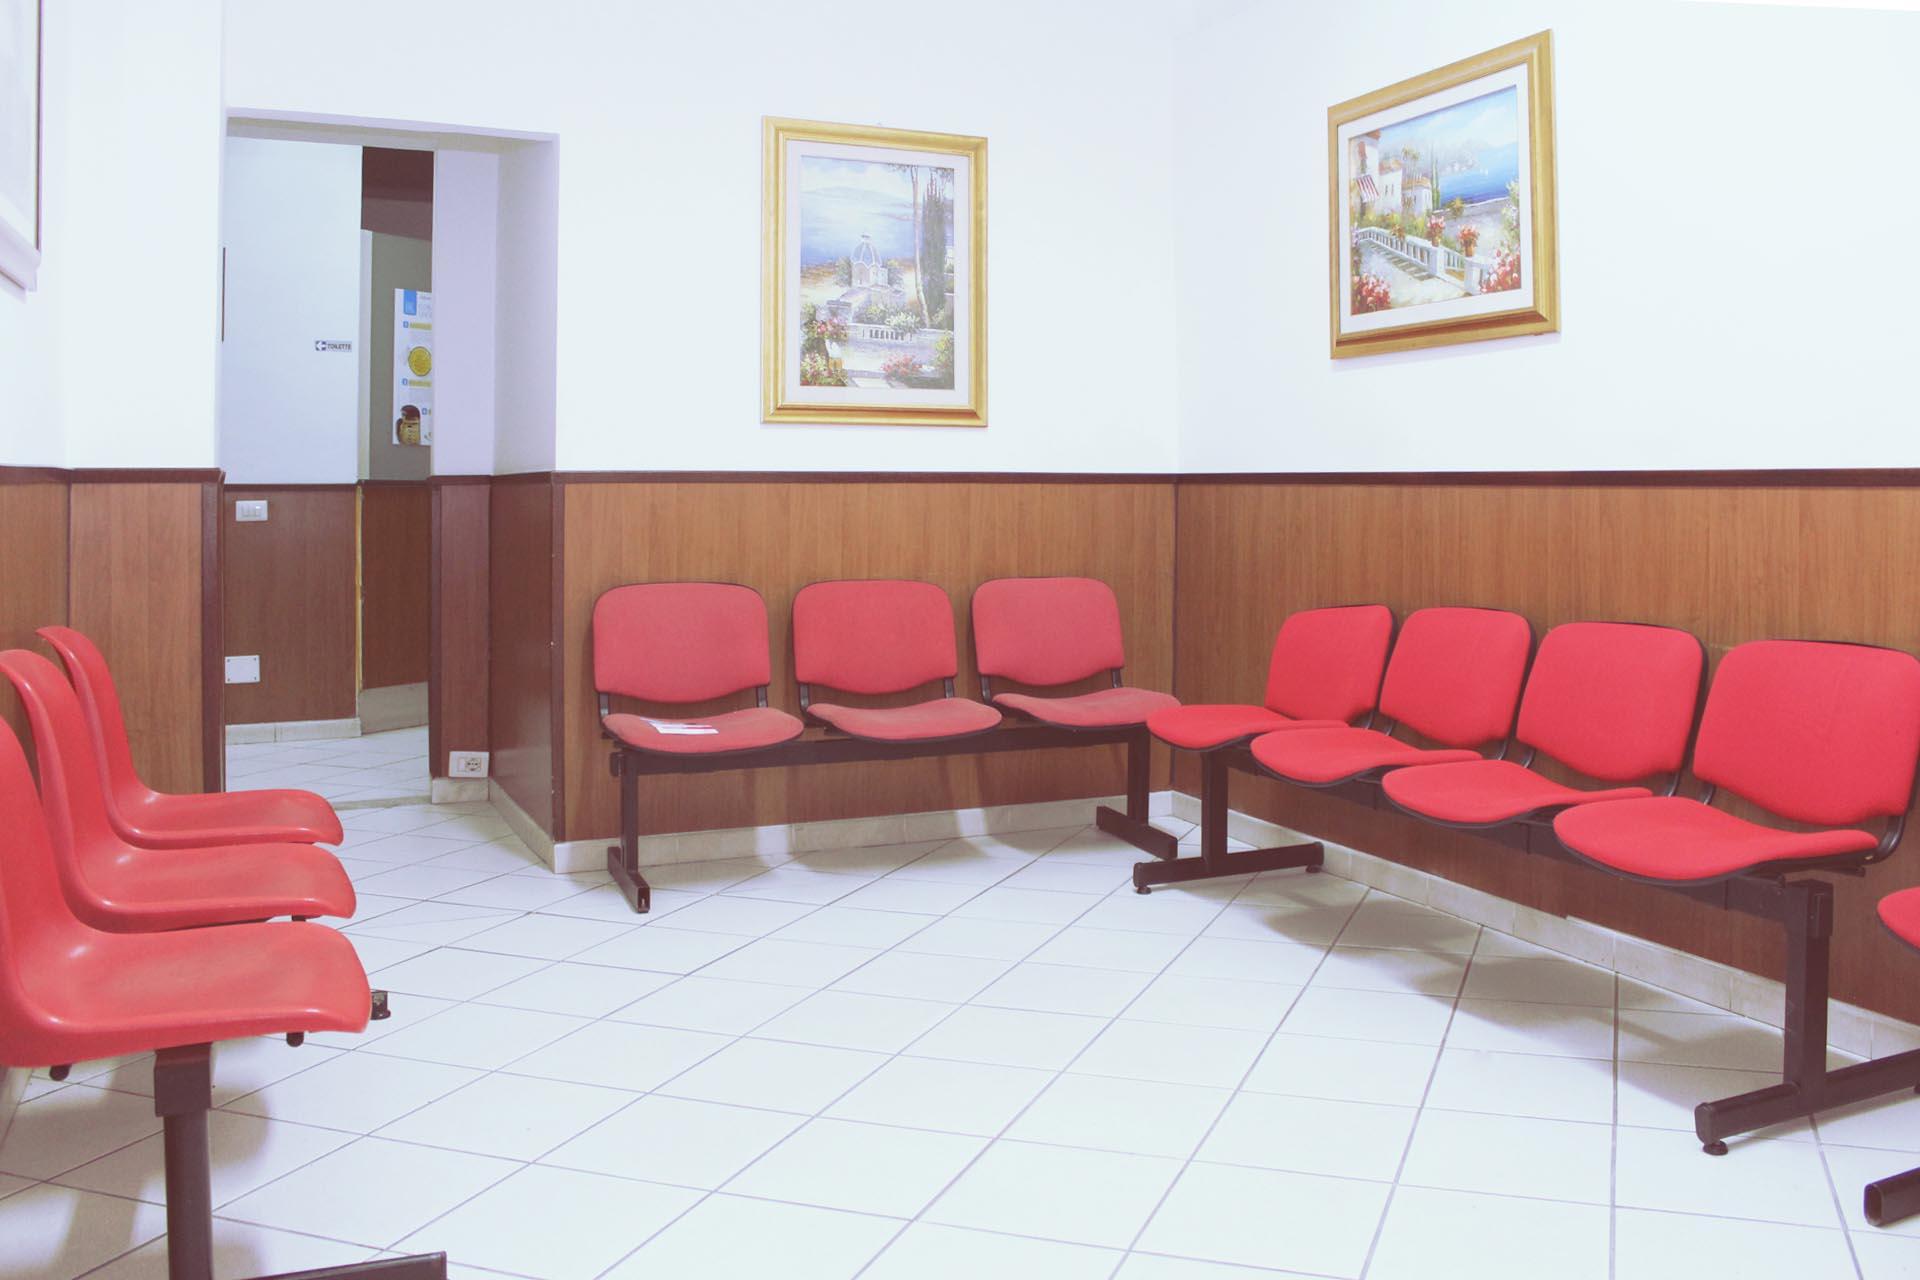 Sala di attesa AID Caserta